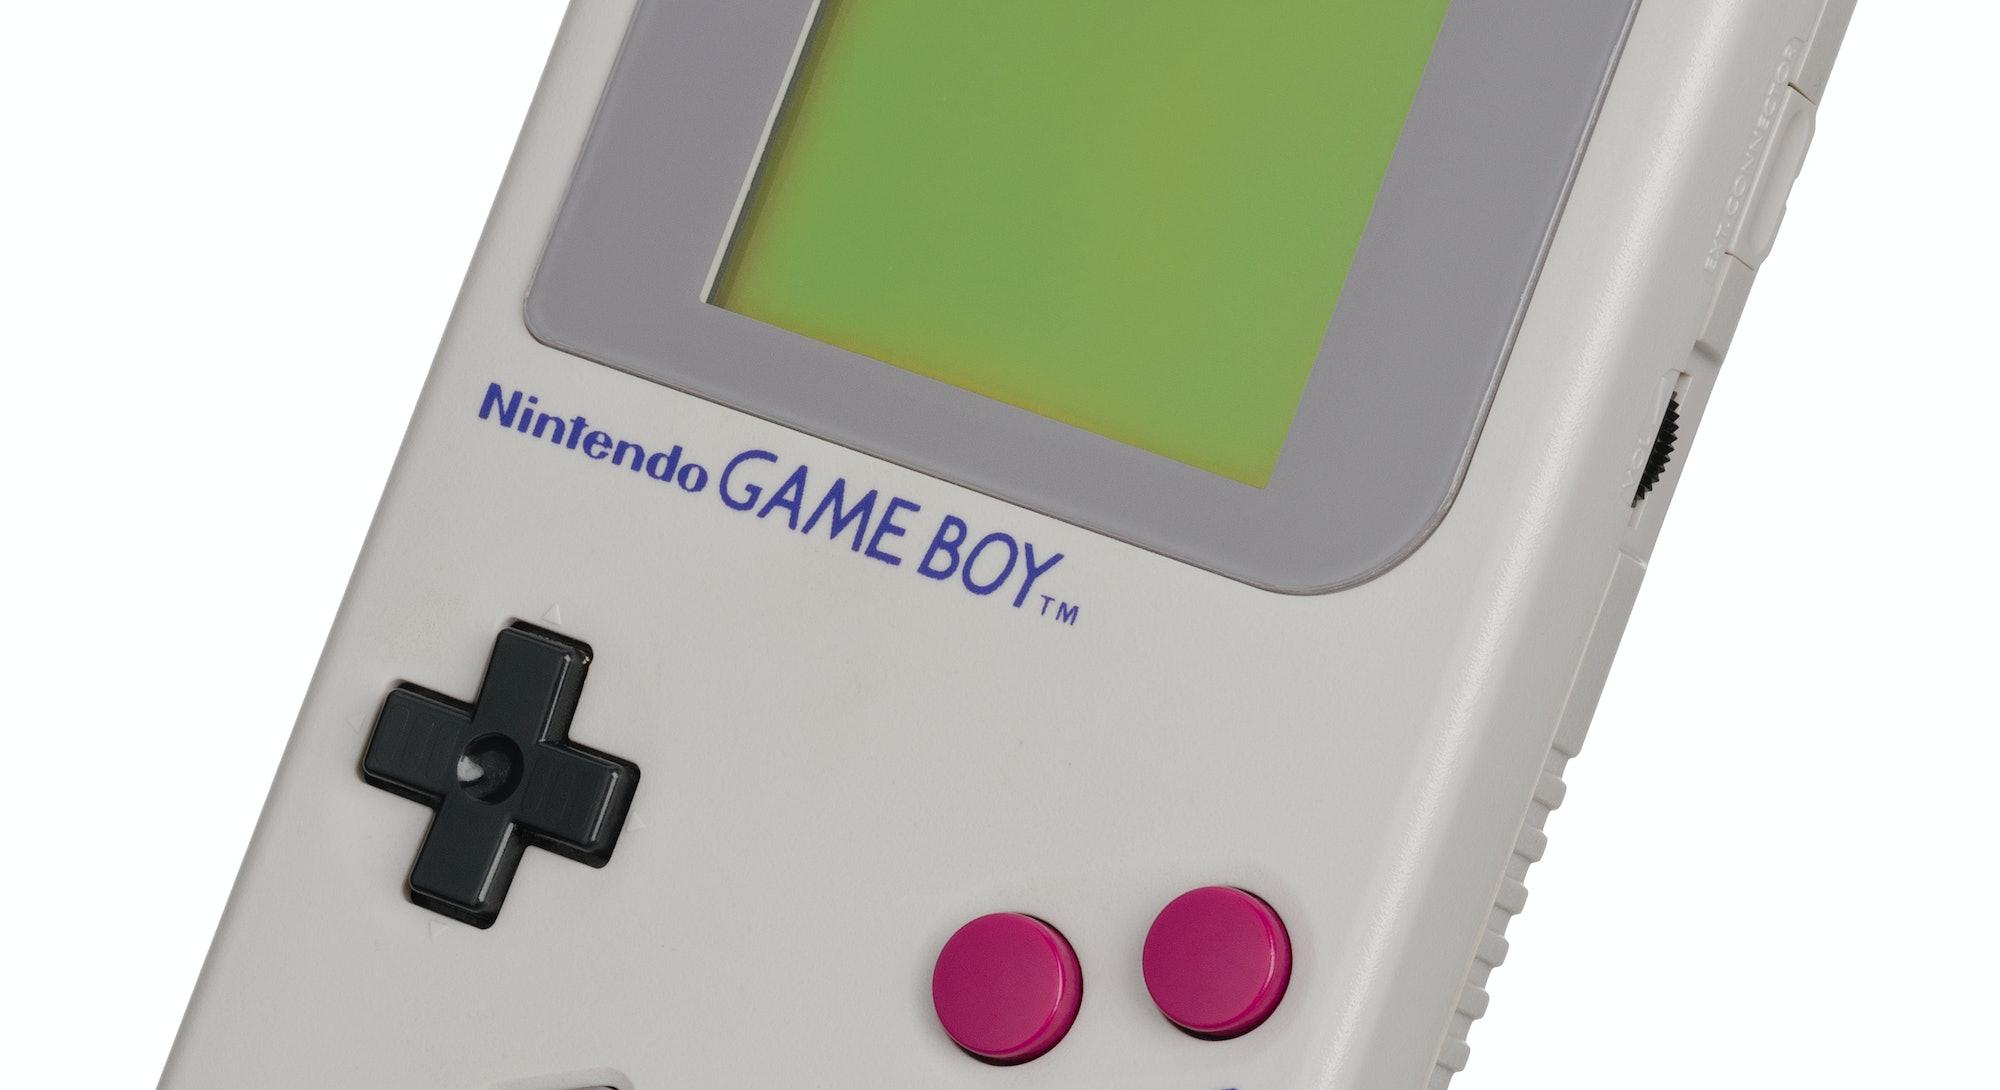 An original Nintendo Game Boy